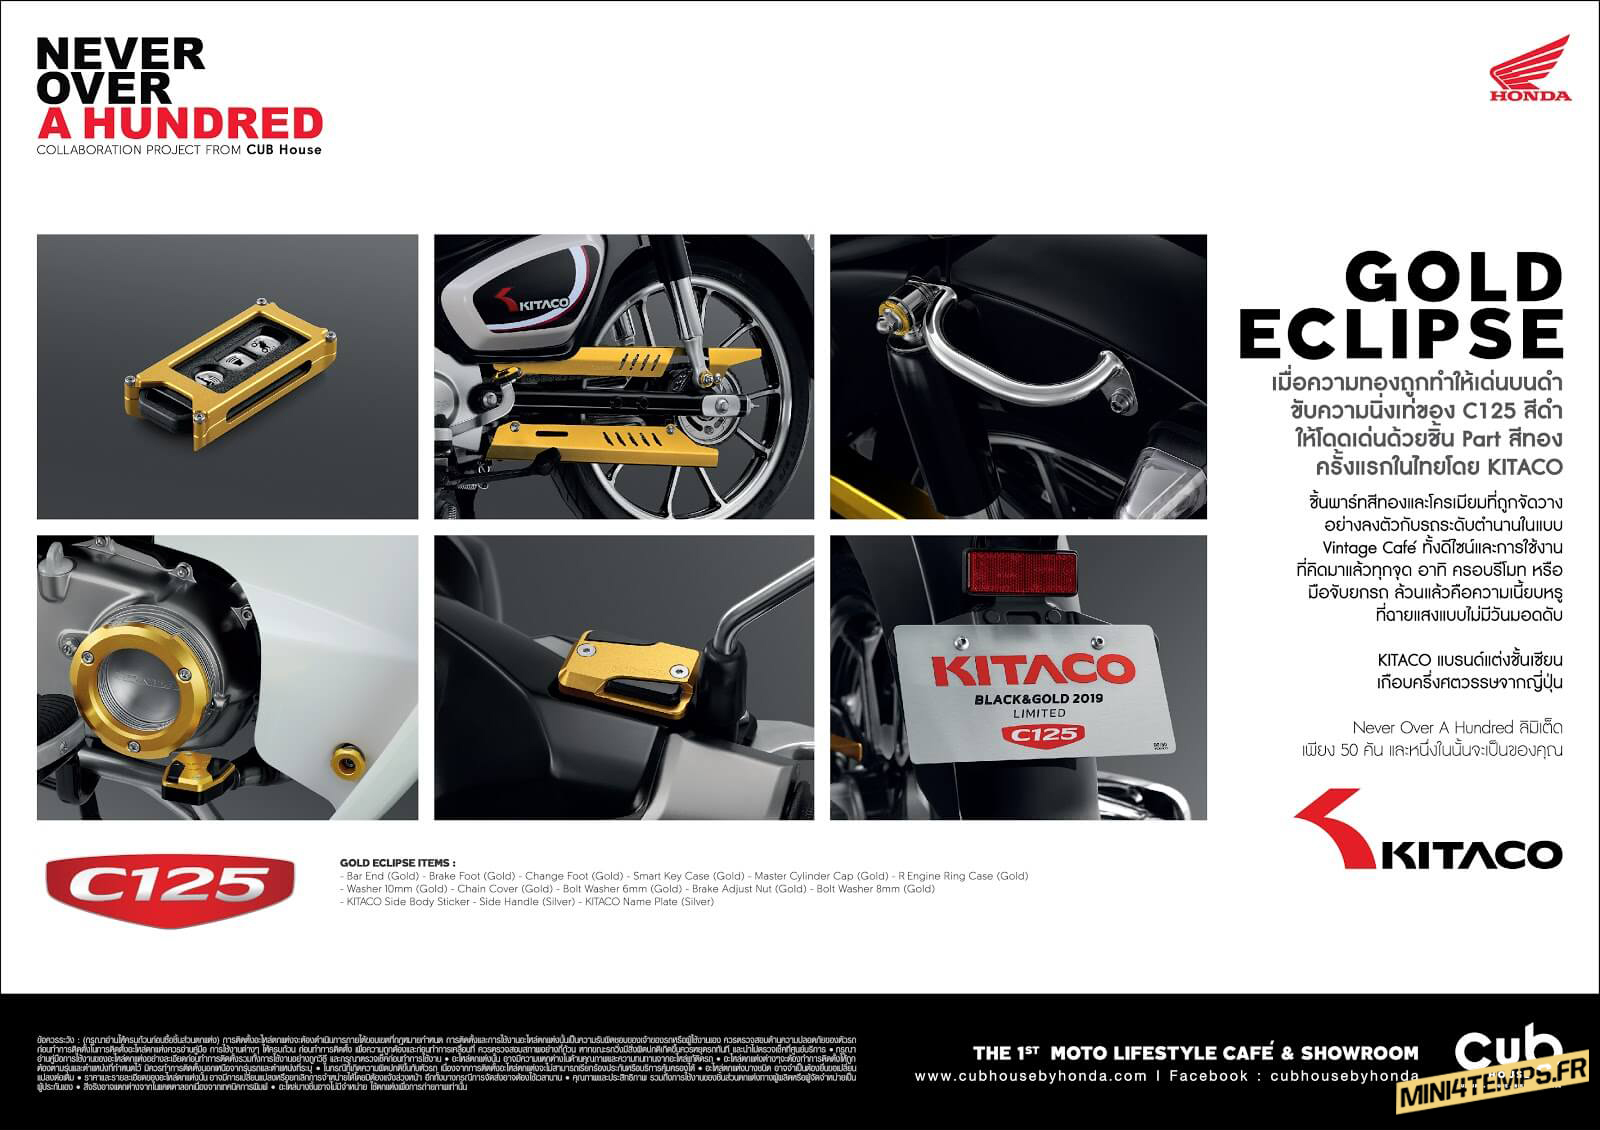 Kitaco Honda Cub 125 Gold Eclipse - mini4temps.fr